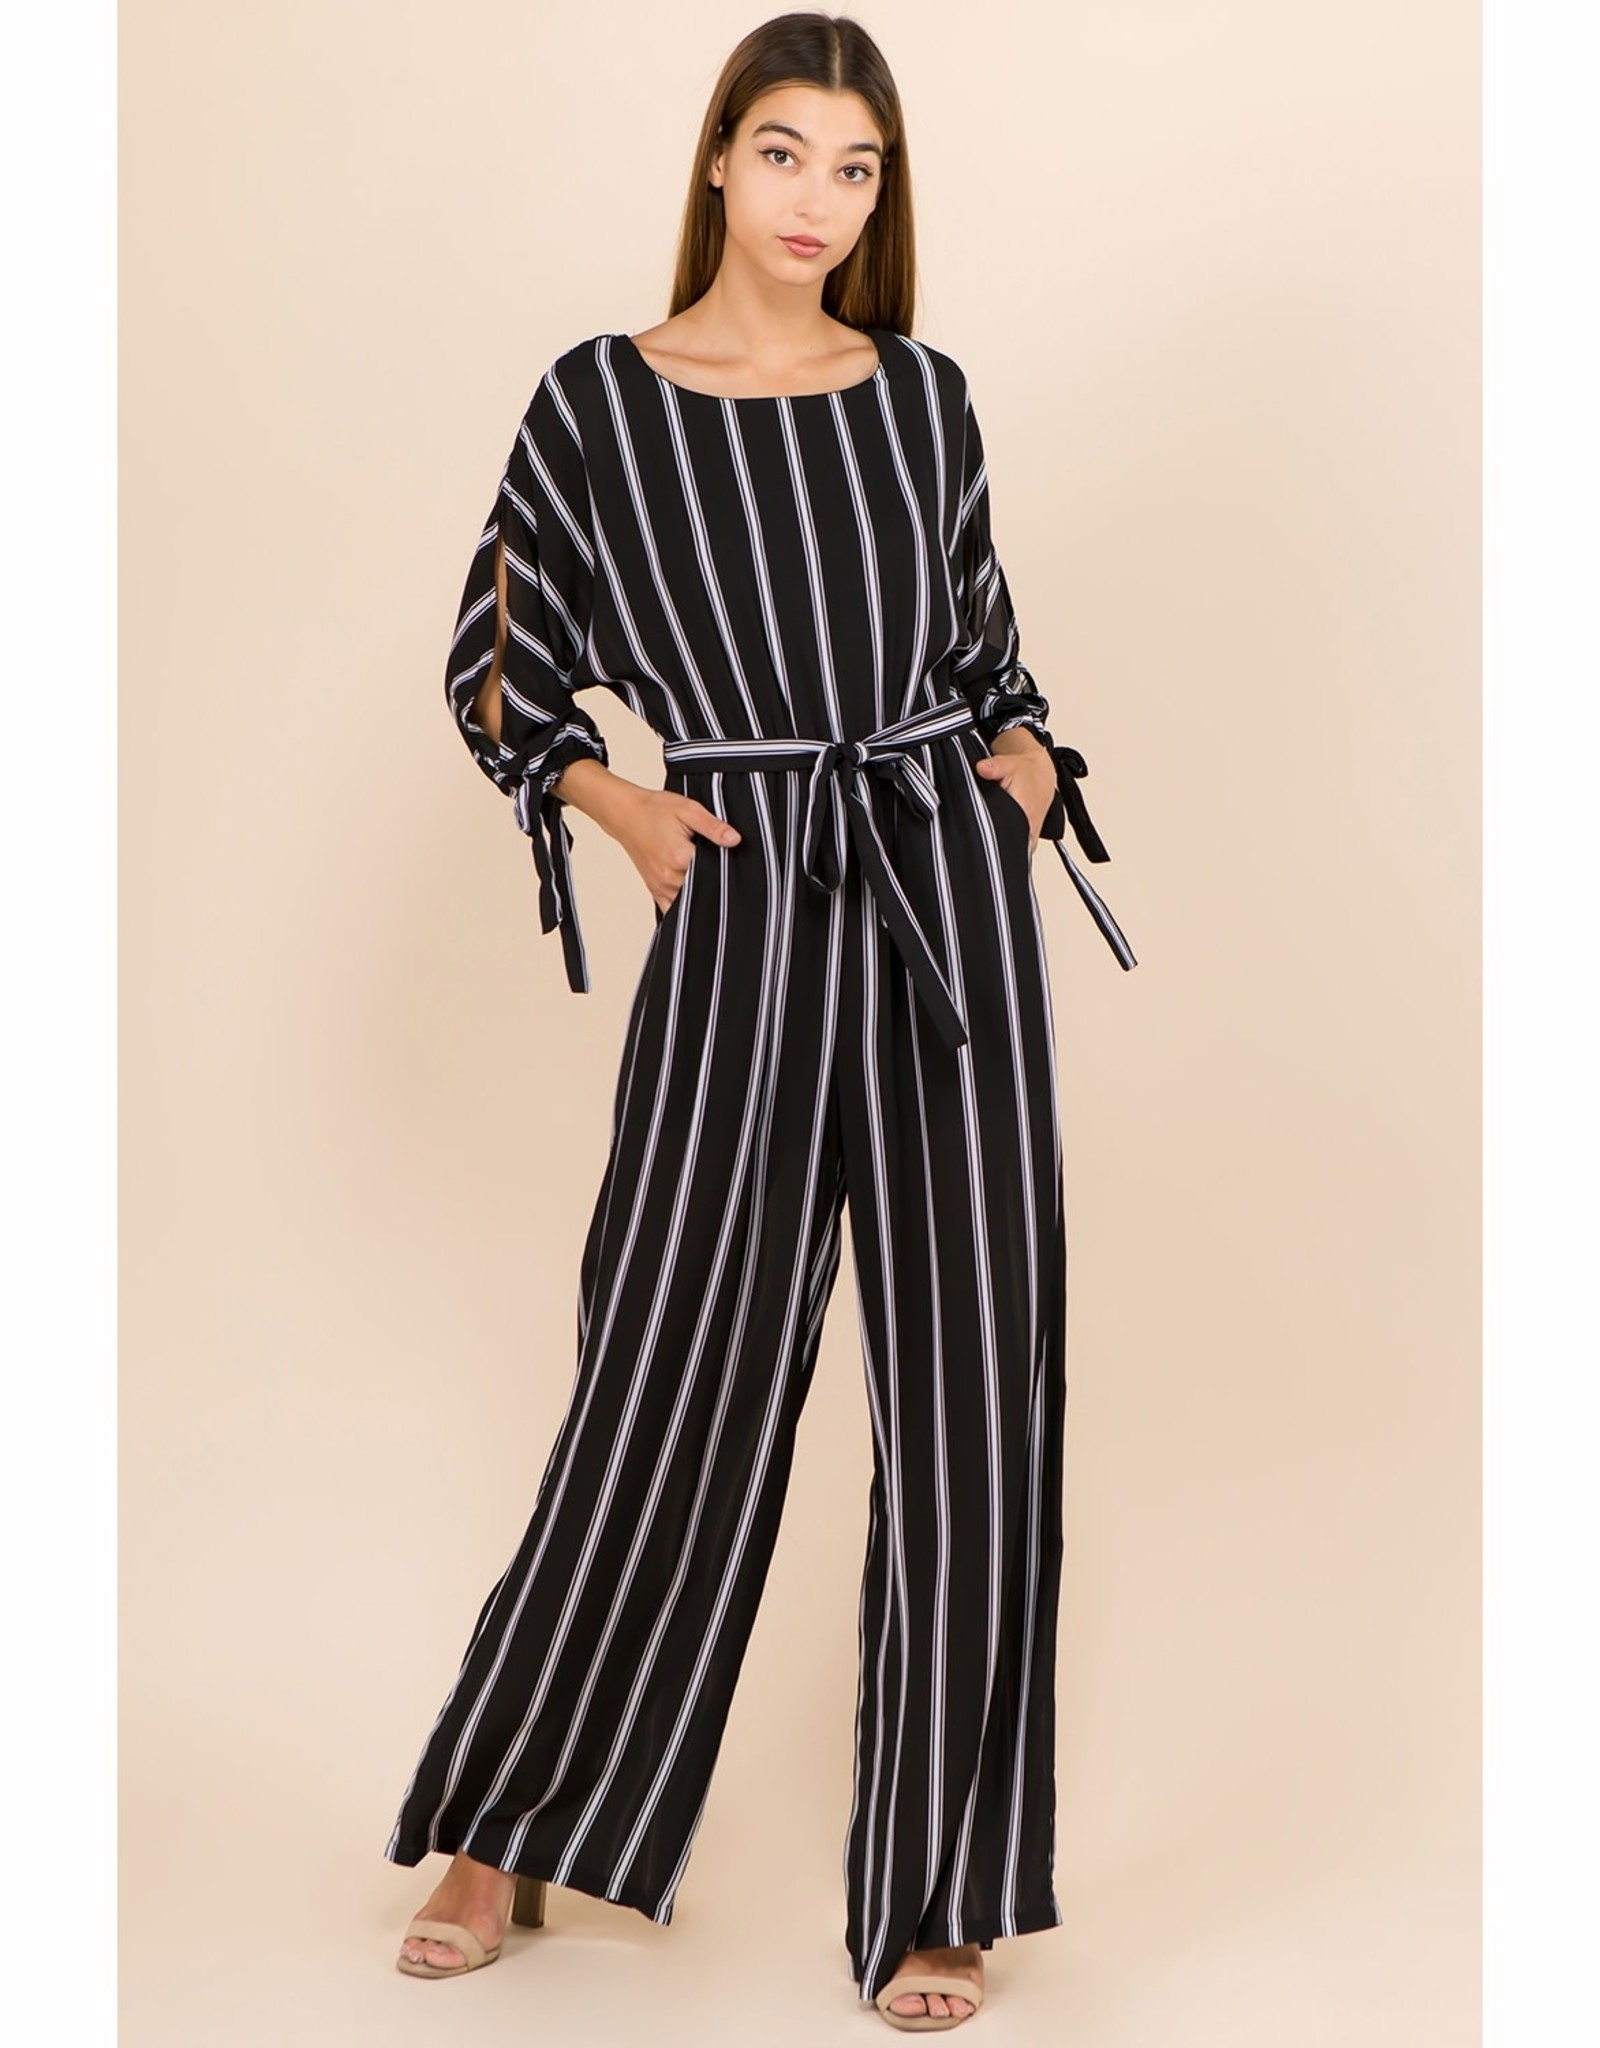 Black/White Stripe Jumpsuit